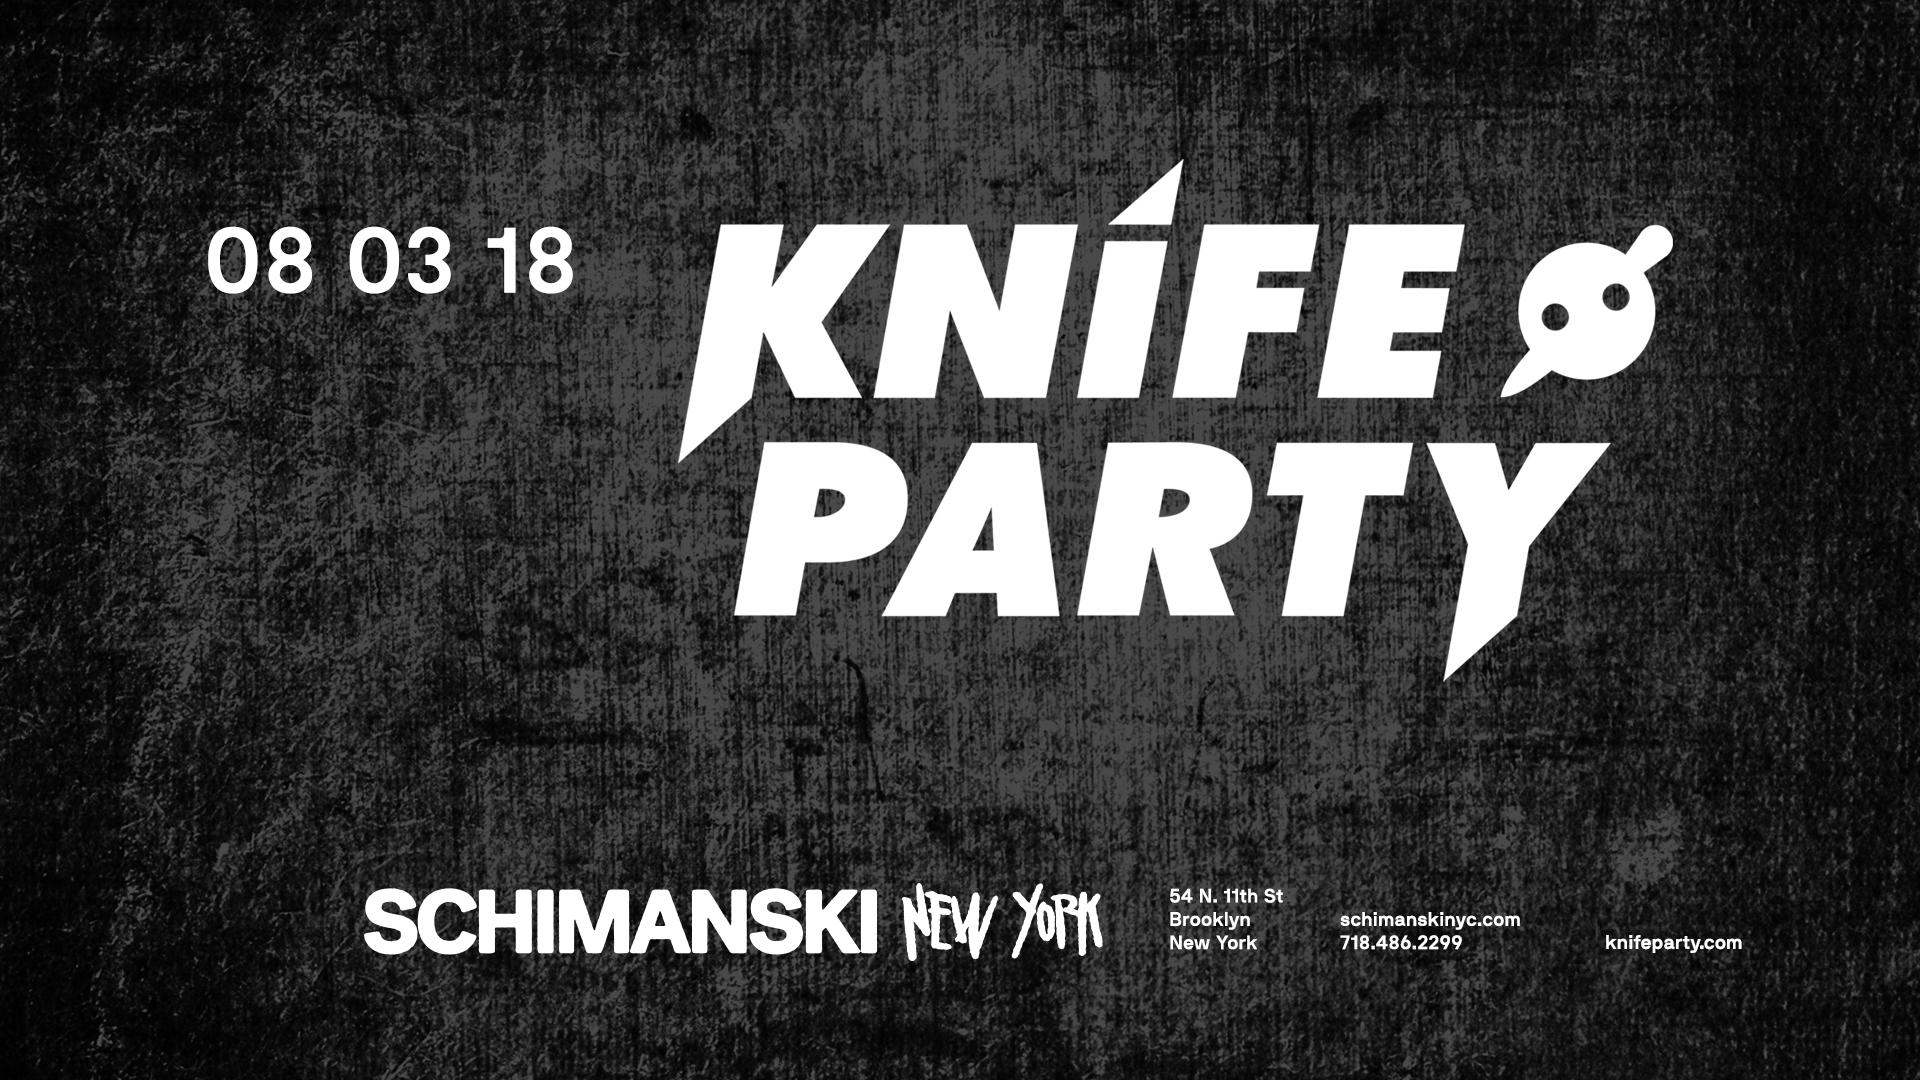 KnifeParty_FBevent_promo.jpg